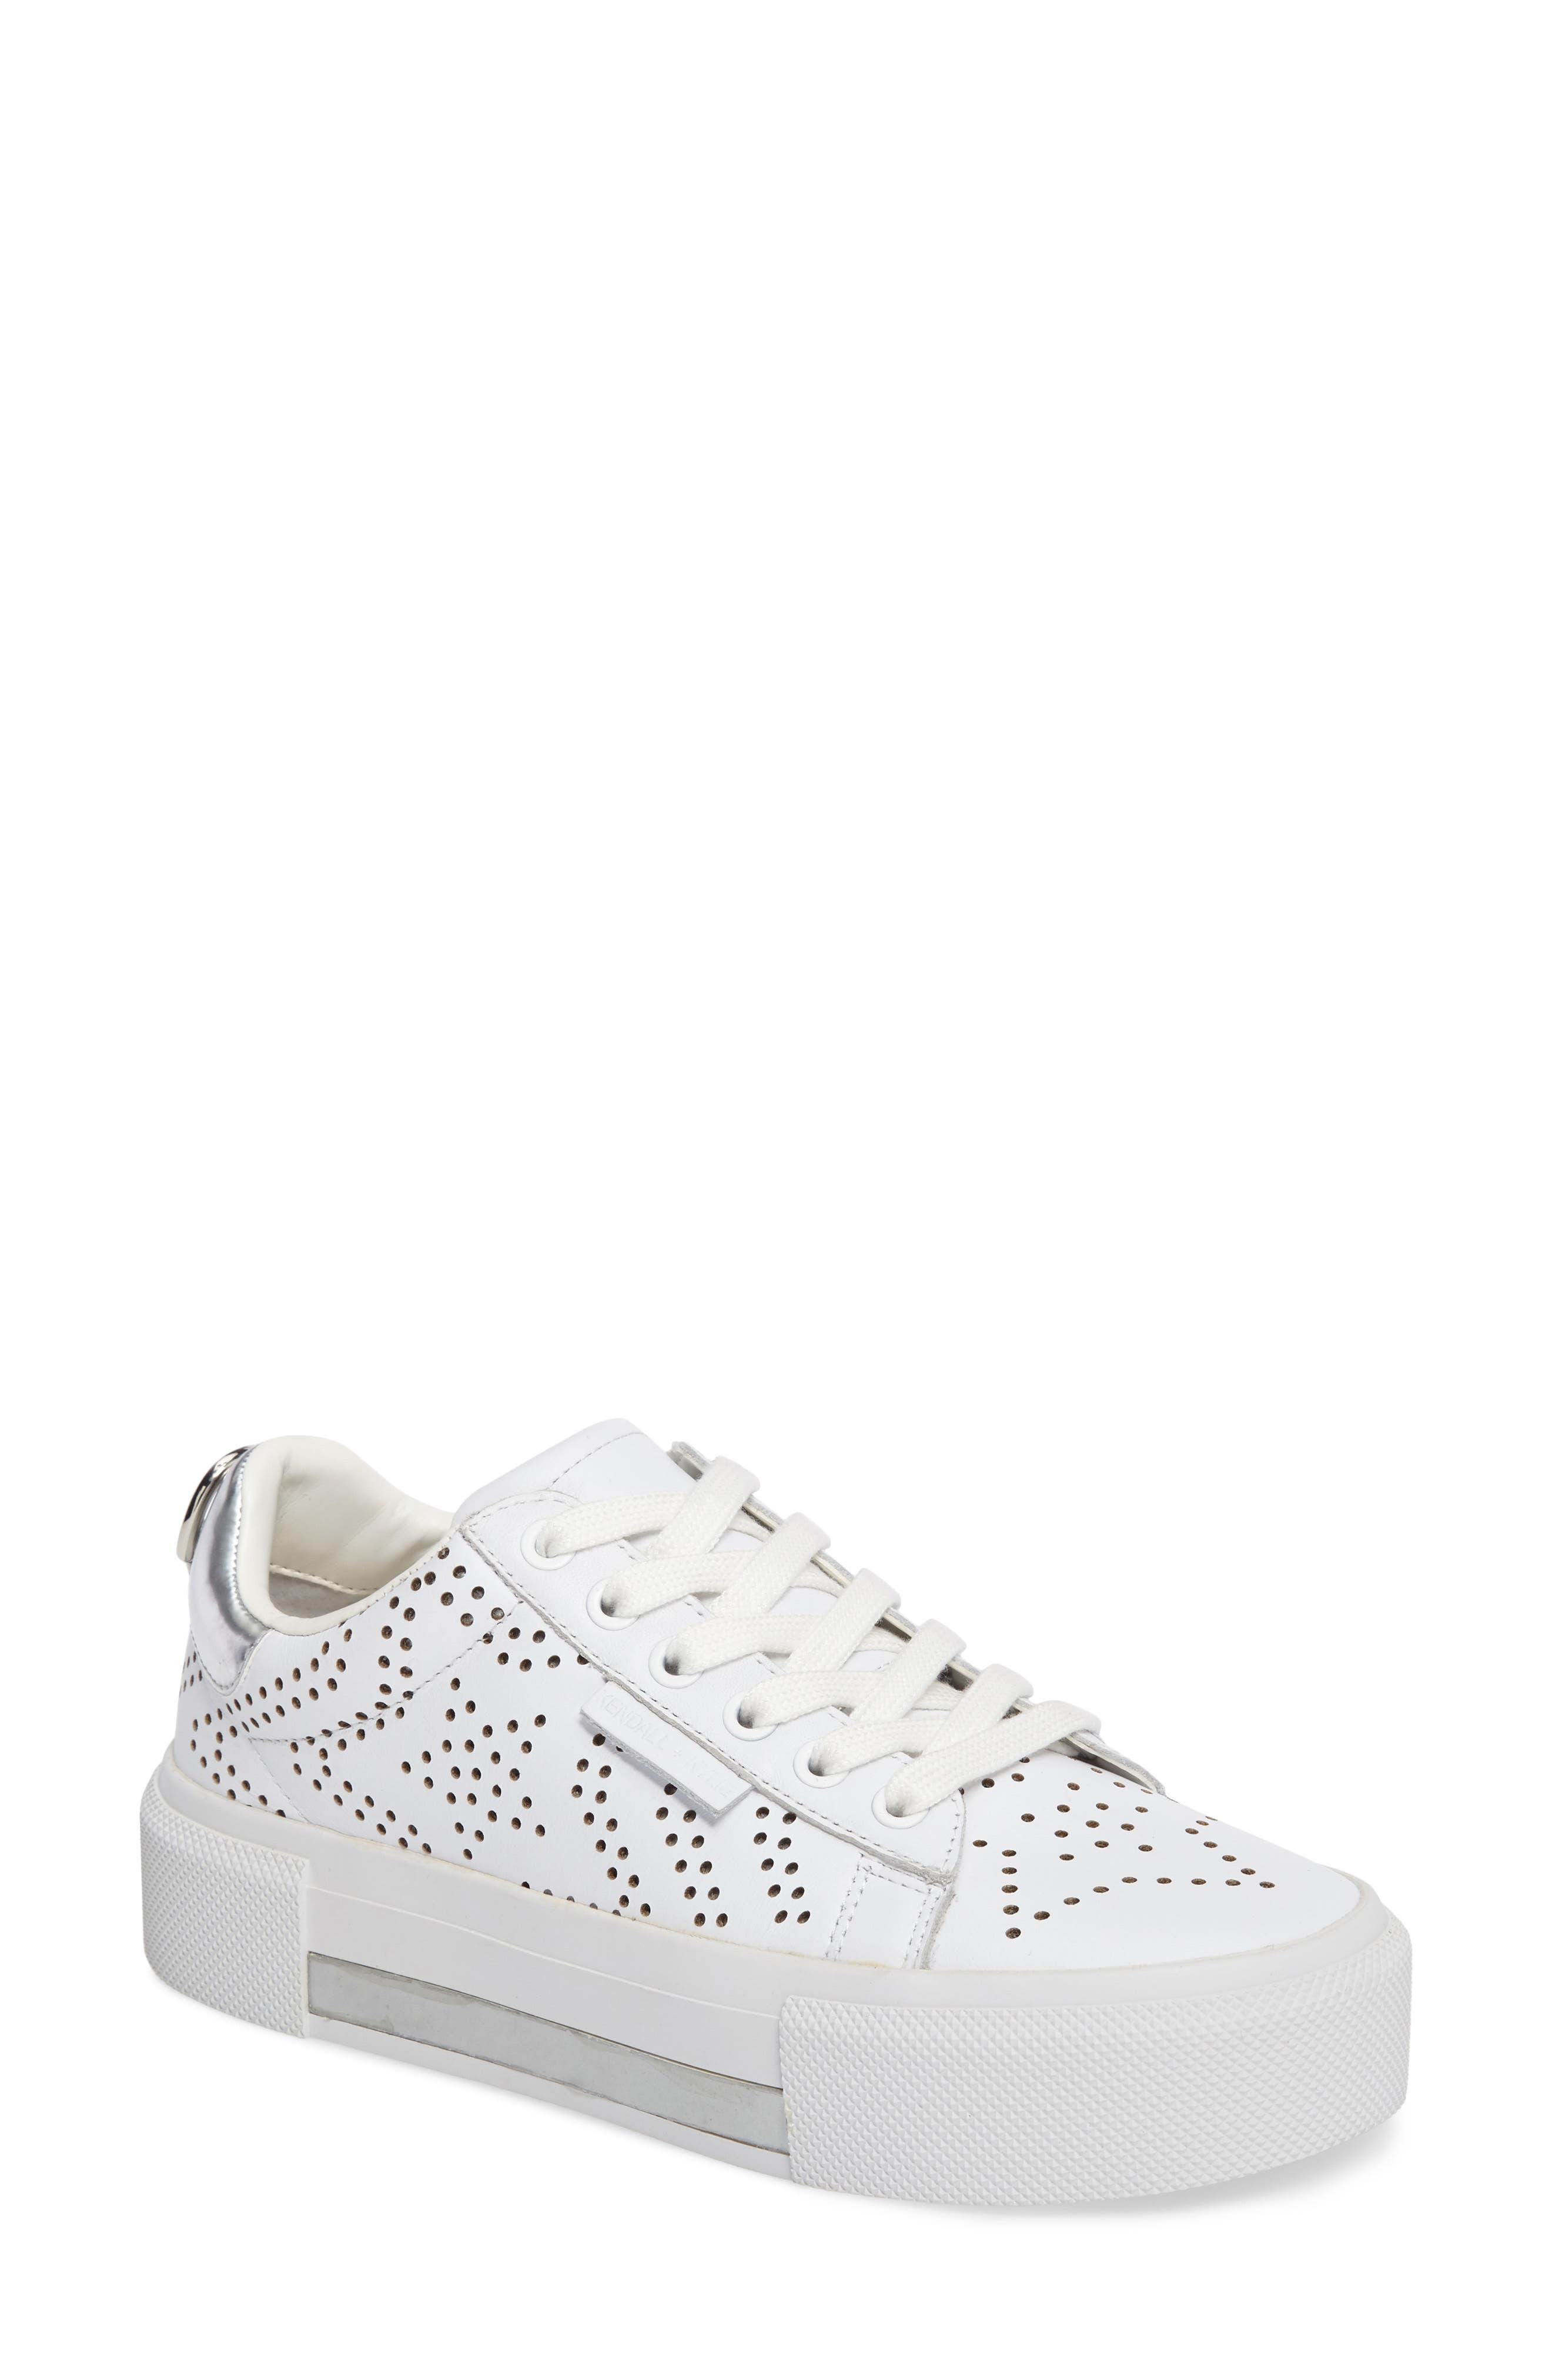 Main Image - KENDALL + KYLIE Tyler Platform Sneaker (Women)